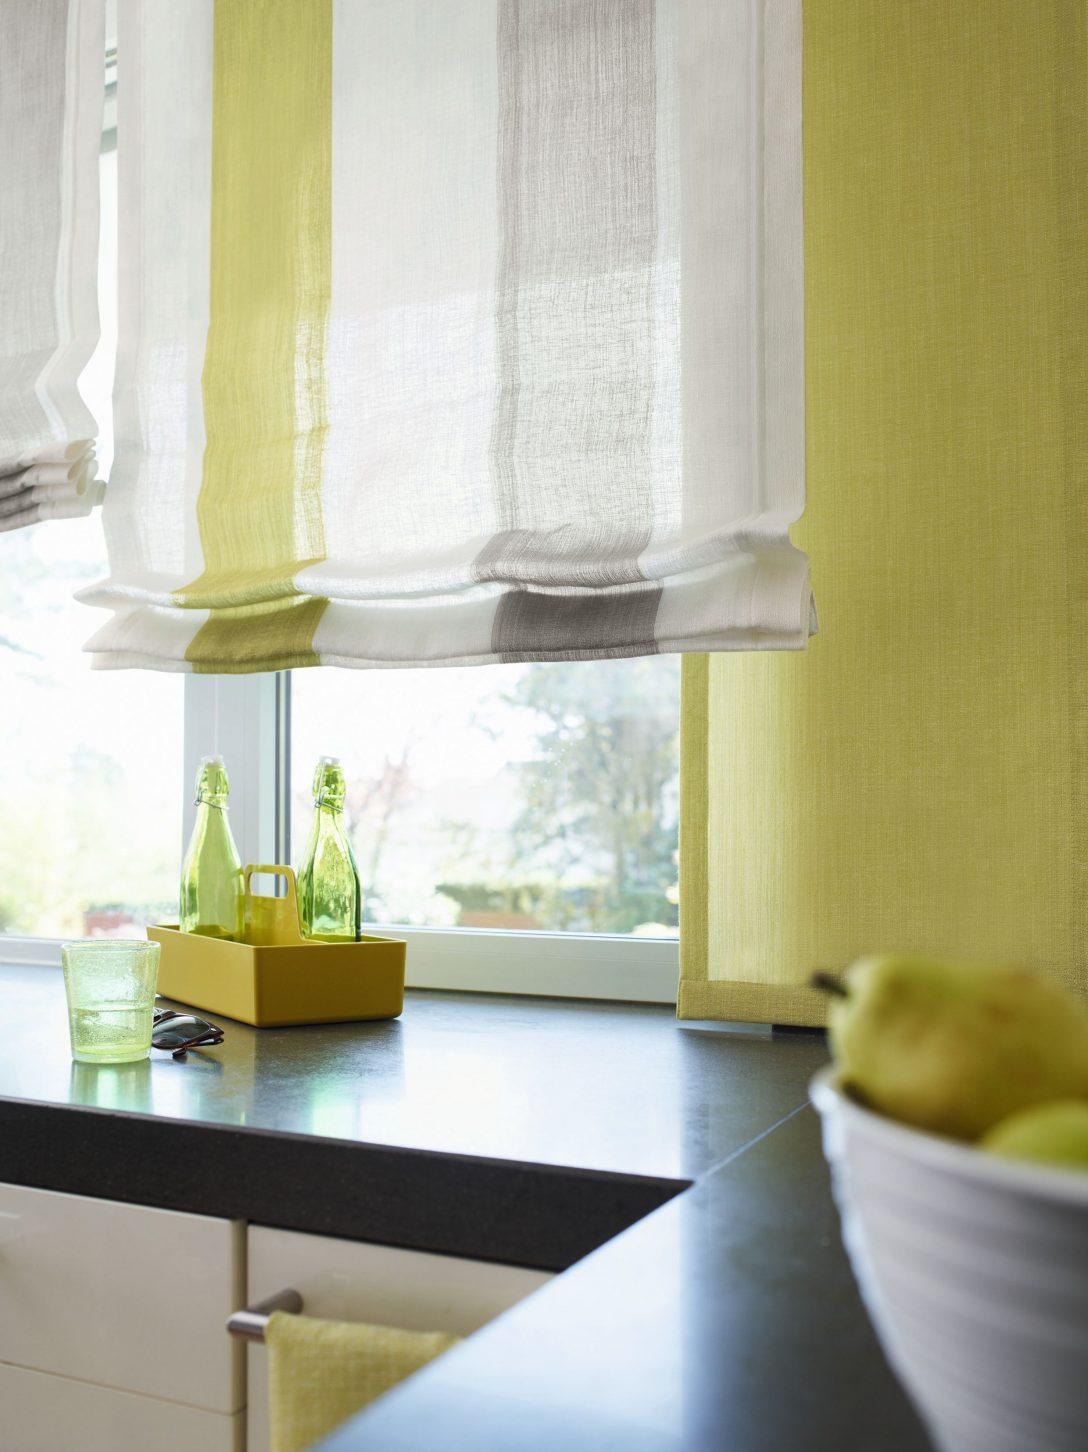 Large Size of Raffrollo Küche Kaffee Raffrollo Küche Beige Raffrollo Küche Schlaufen Raffrollo Küche Grün Küche Raffrollo Küche